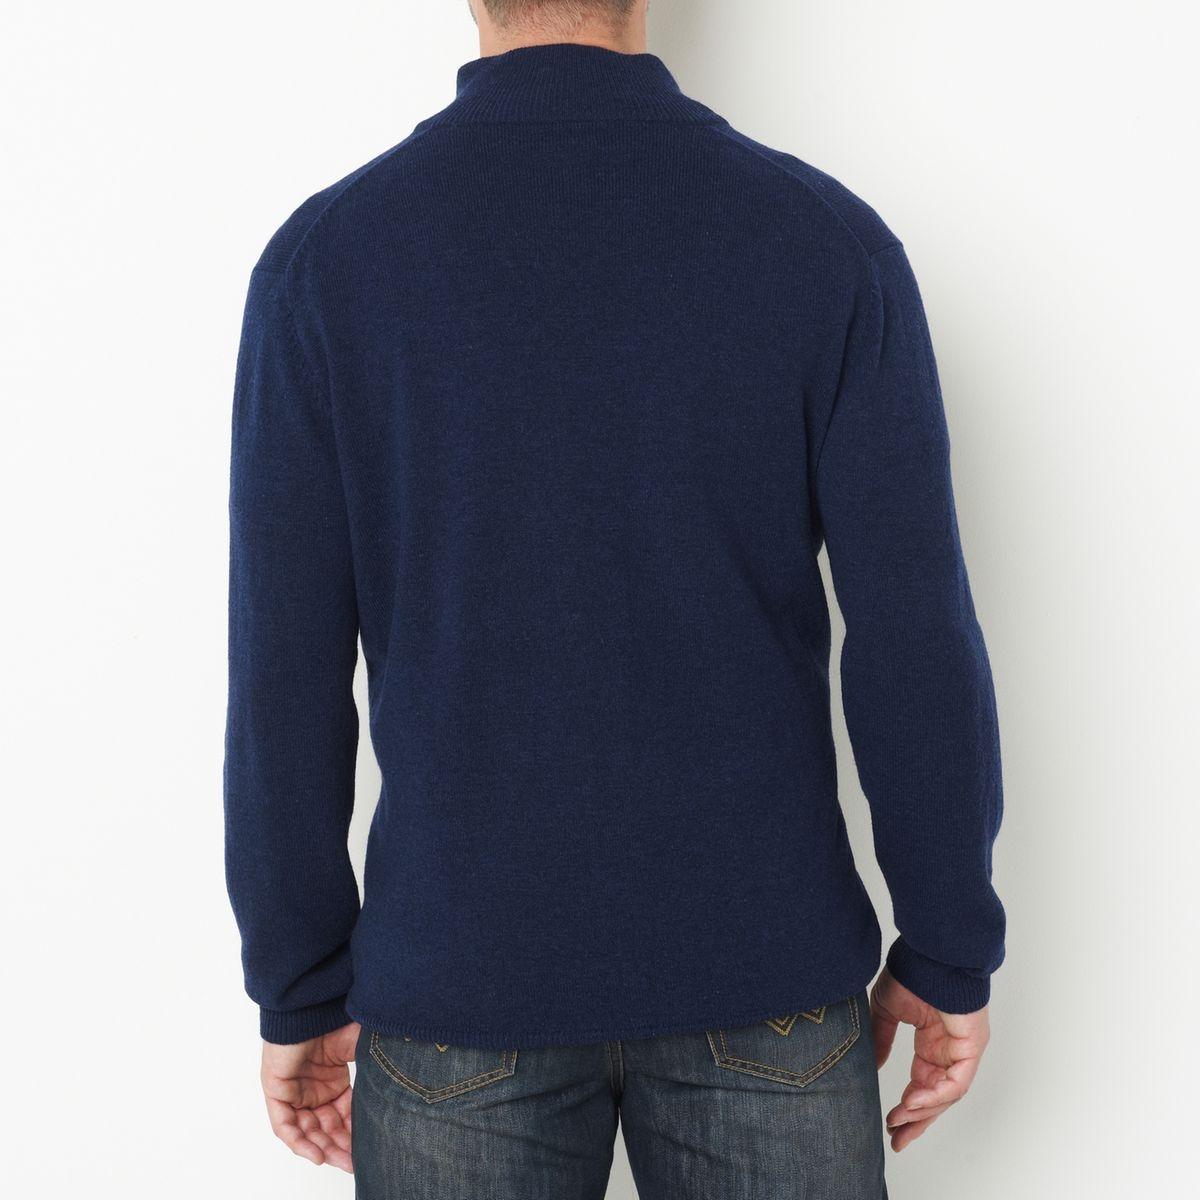 Bleu Rond Et T shirt Royal Homme ModeLifestyle Basil Tifosi Courtes Col Manches rdxhsQCotB